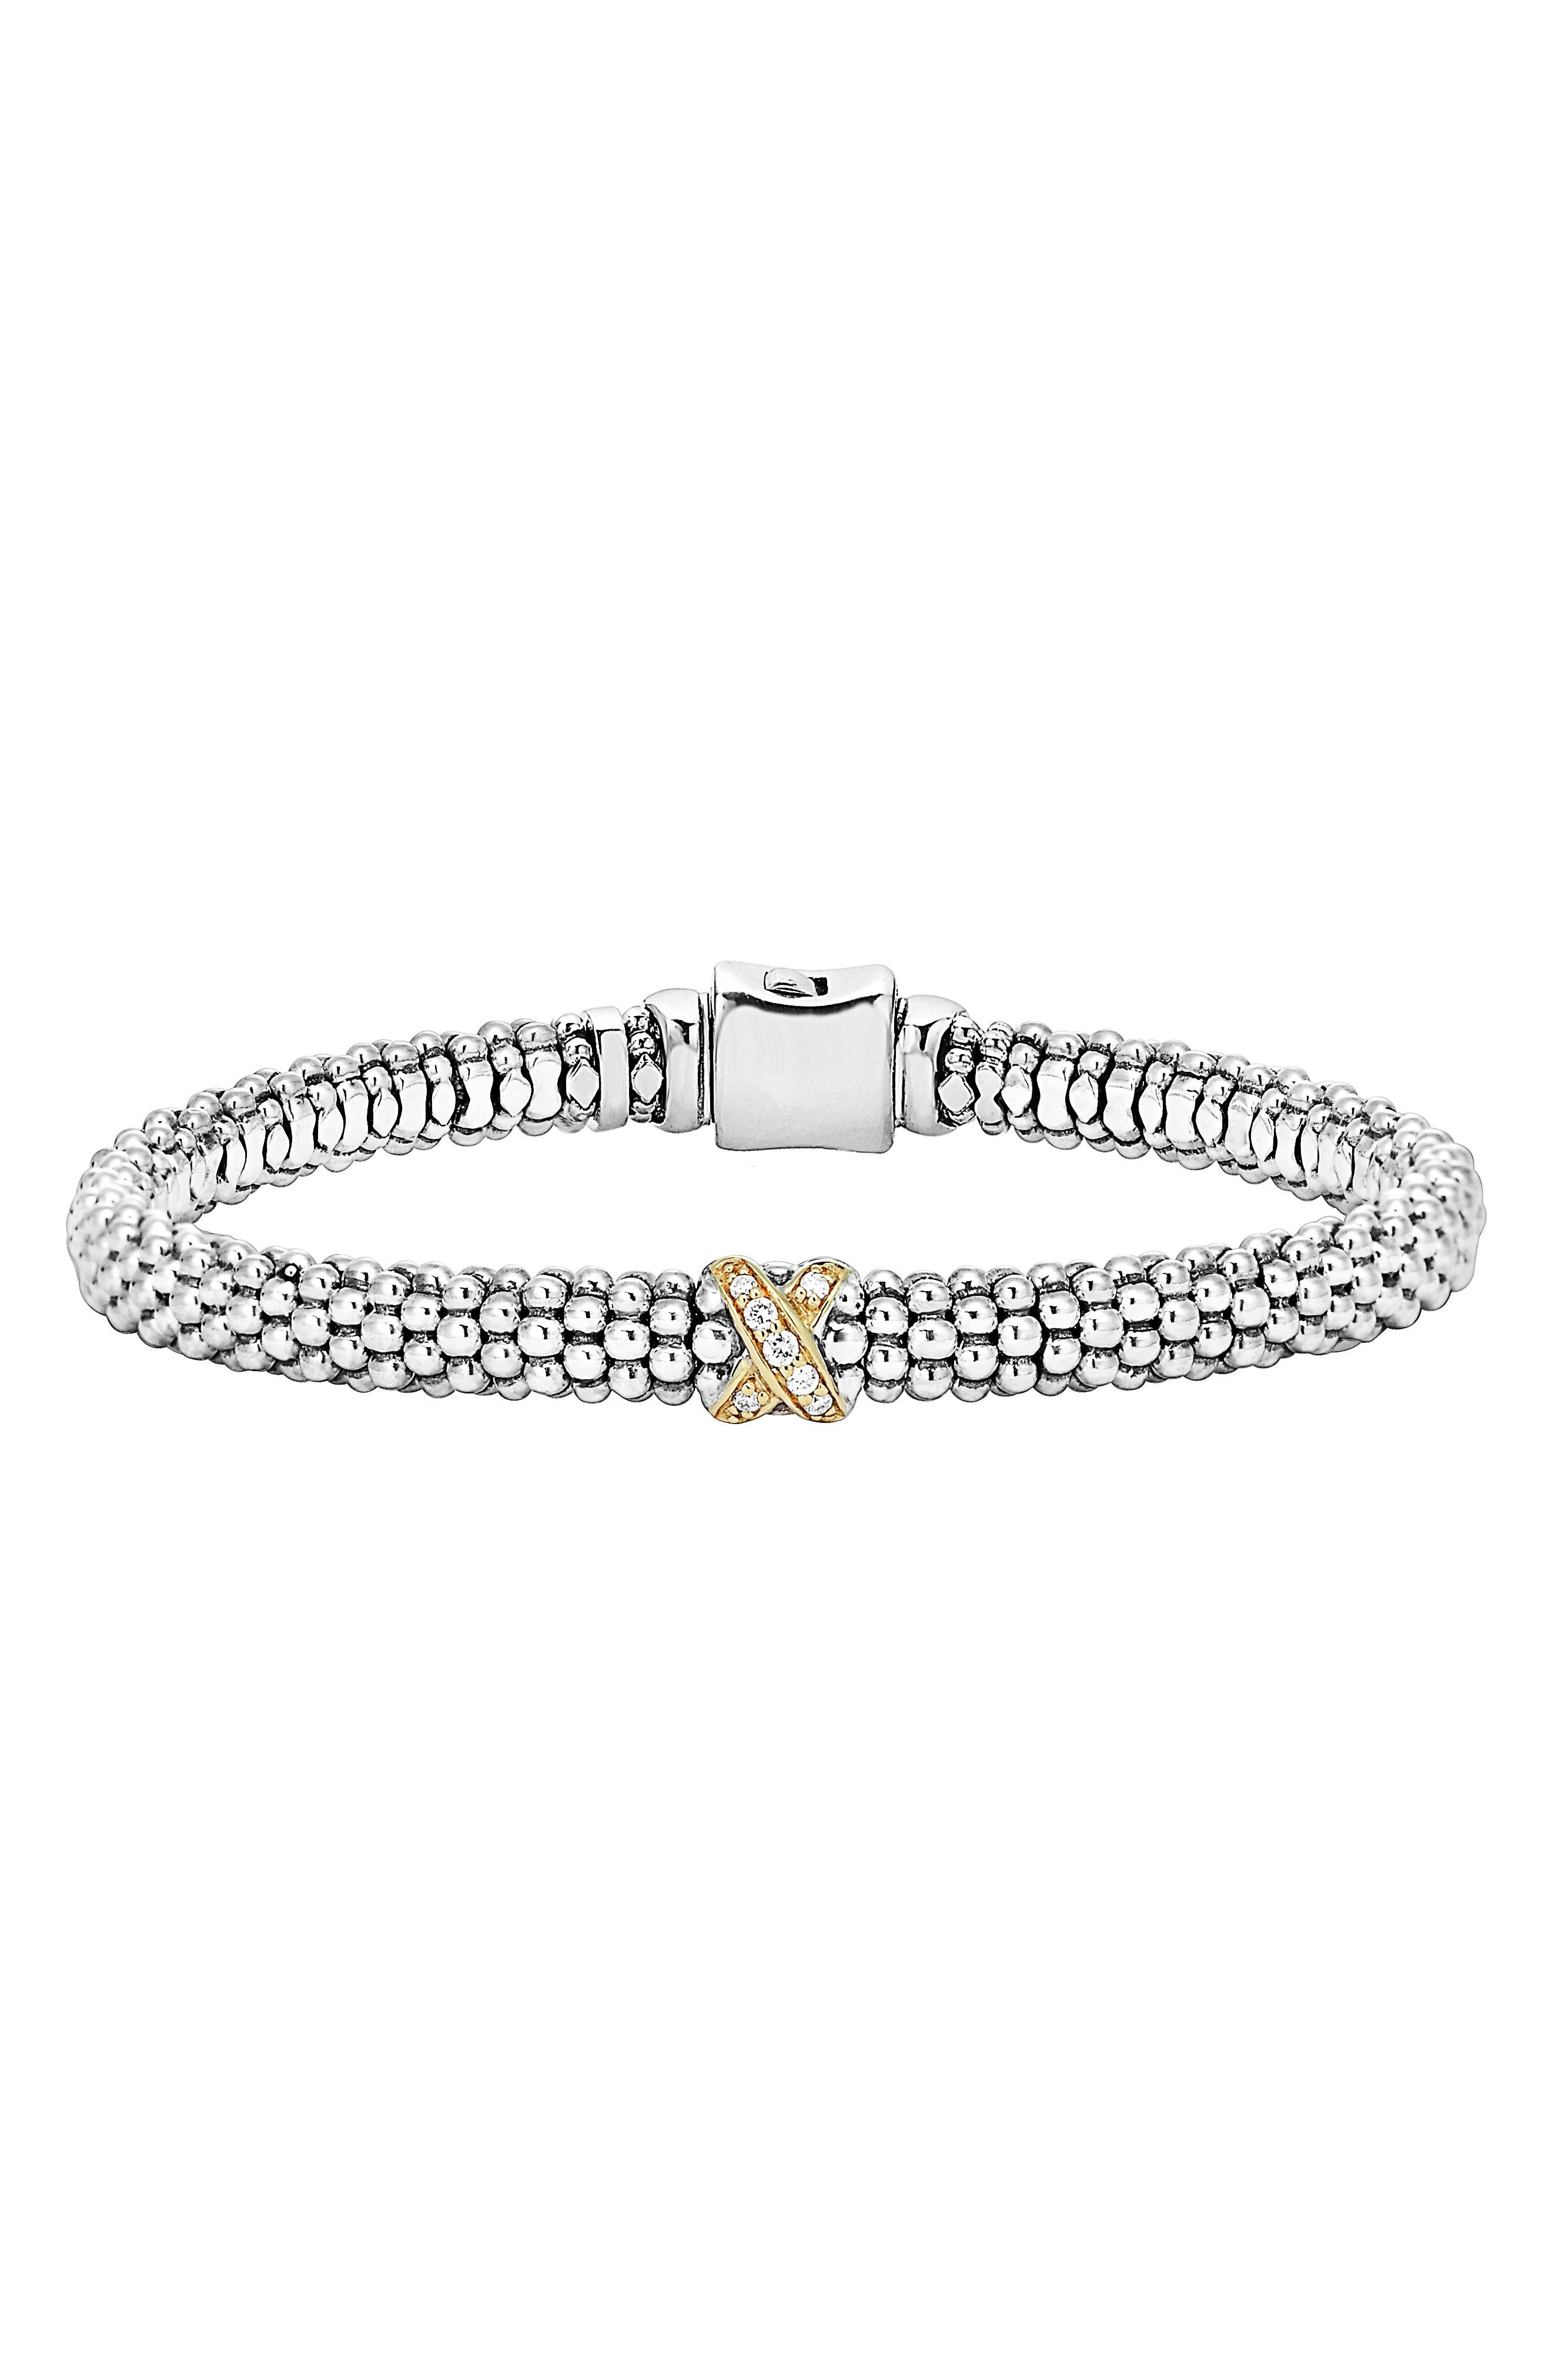 LAGOS Caviar 'Signature Caviar' Diamond Rope Bracelet, Main, color, STERLING SILVER/ GOLD